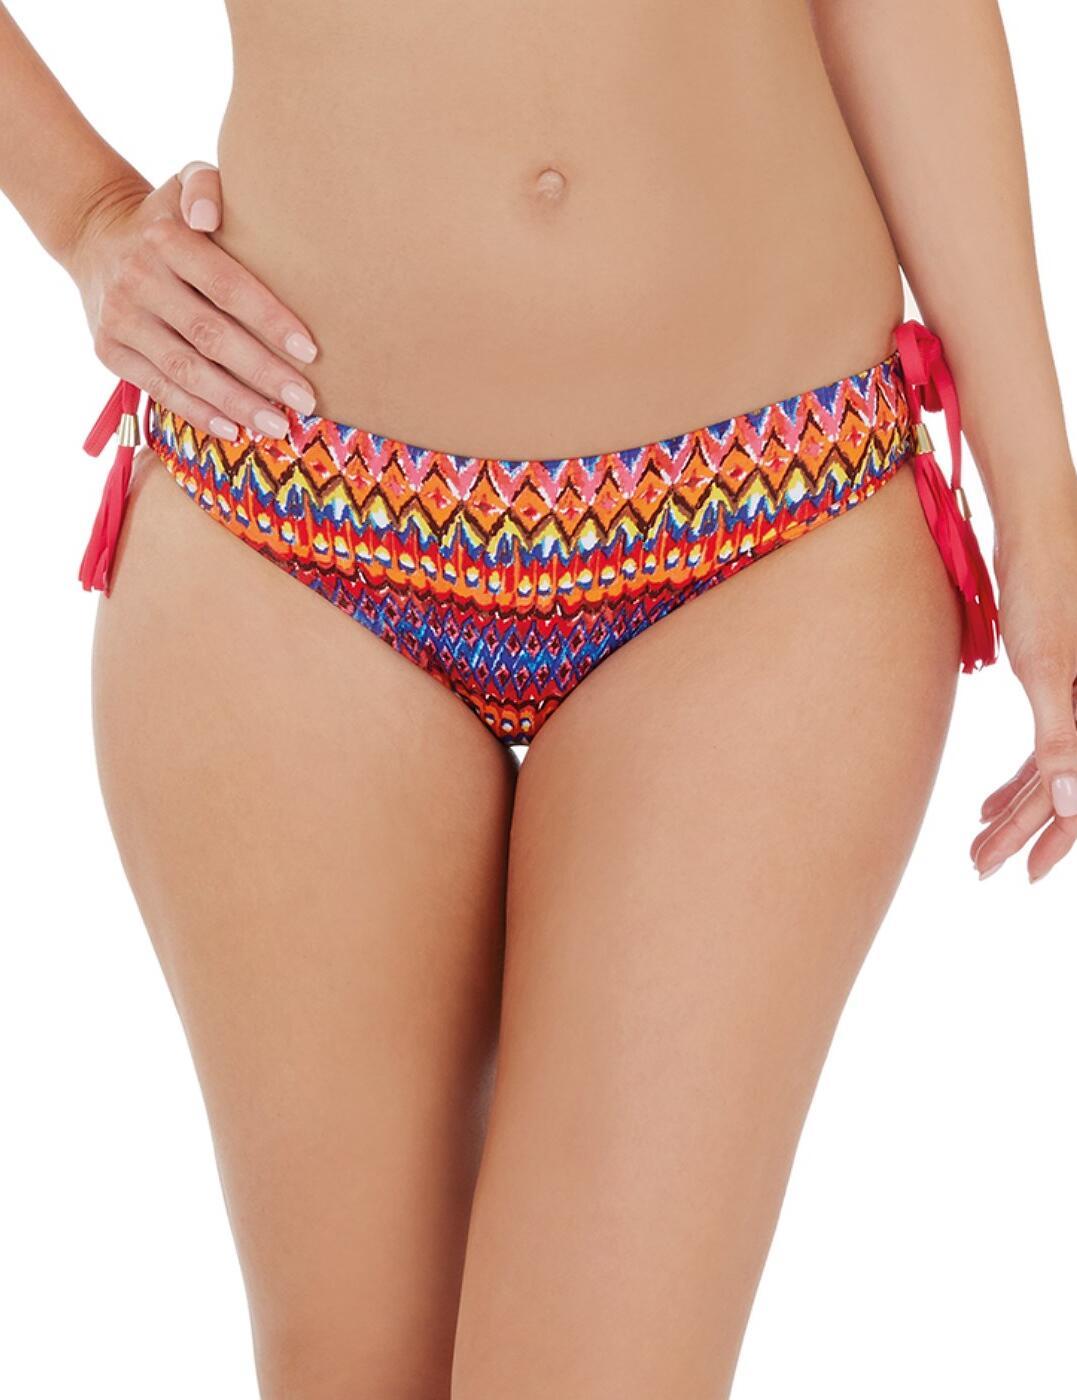 1678700 Lepel Rainbow Beach Low Rise Bikini Pant - 1678700 Pink/Multi